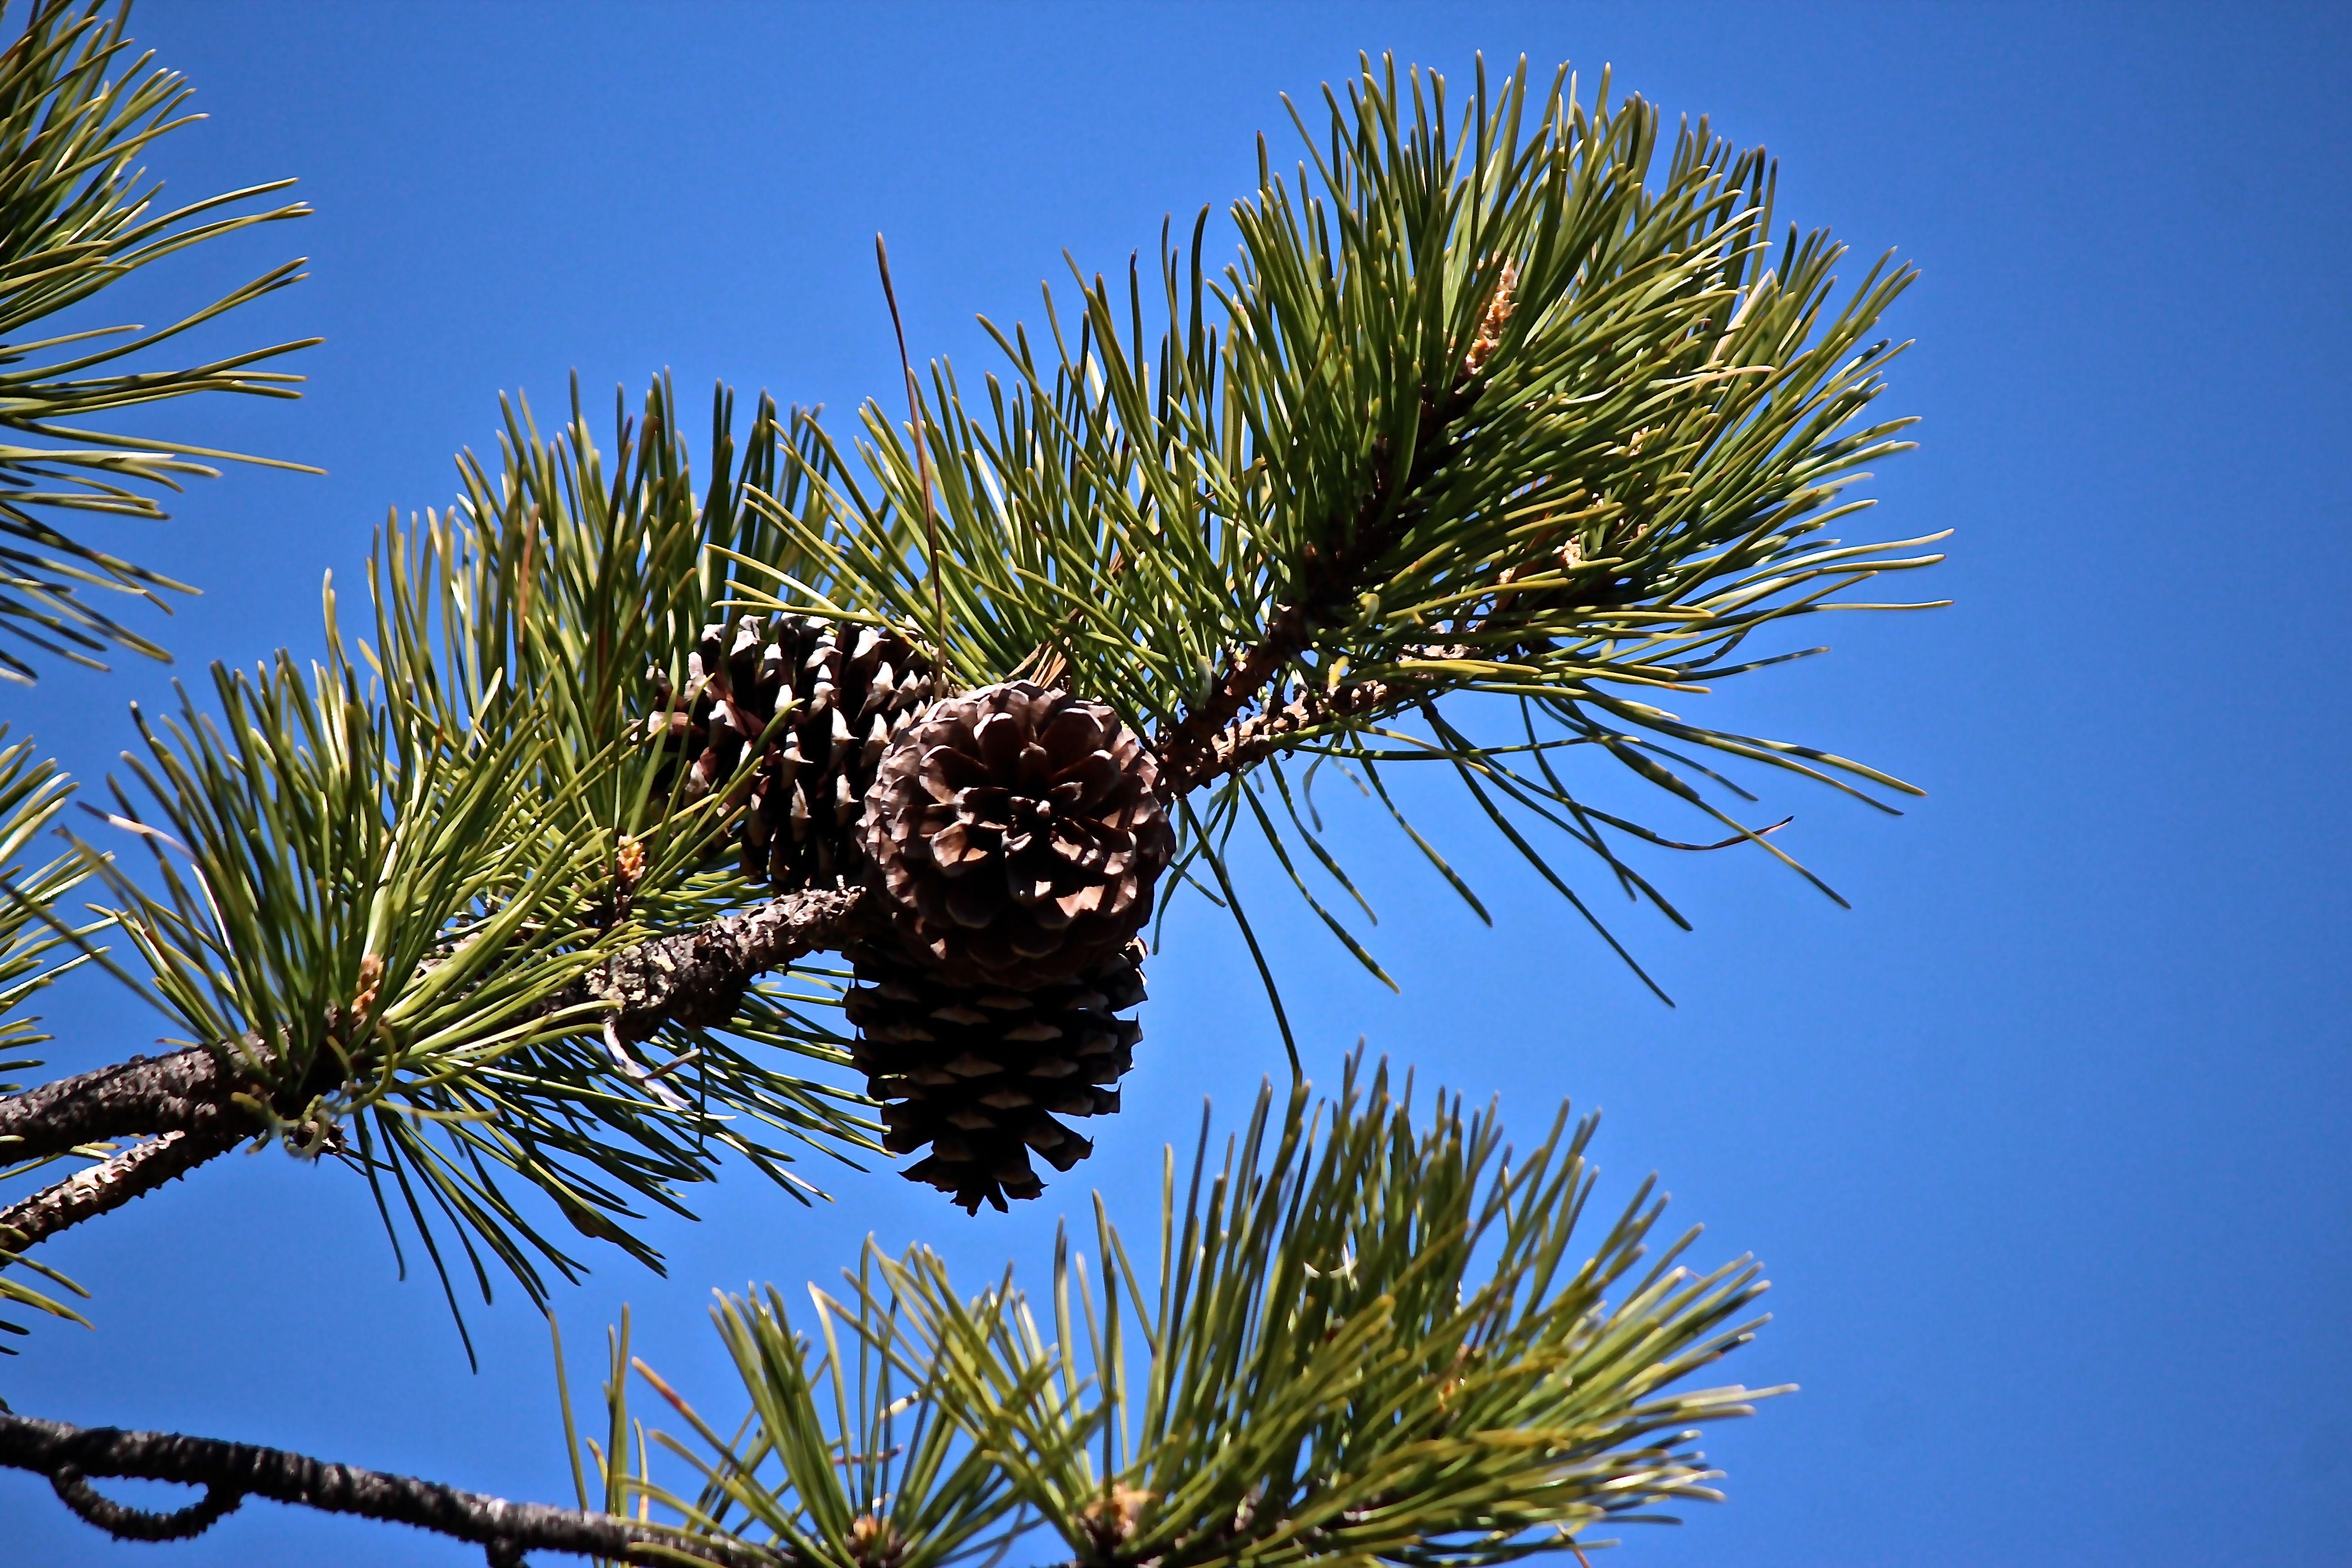 b-pitch pine